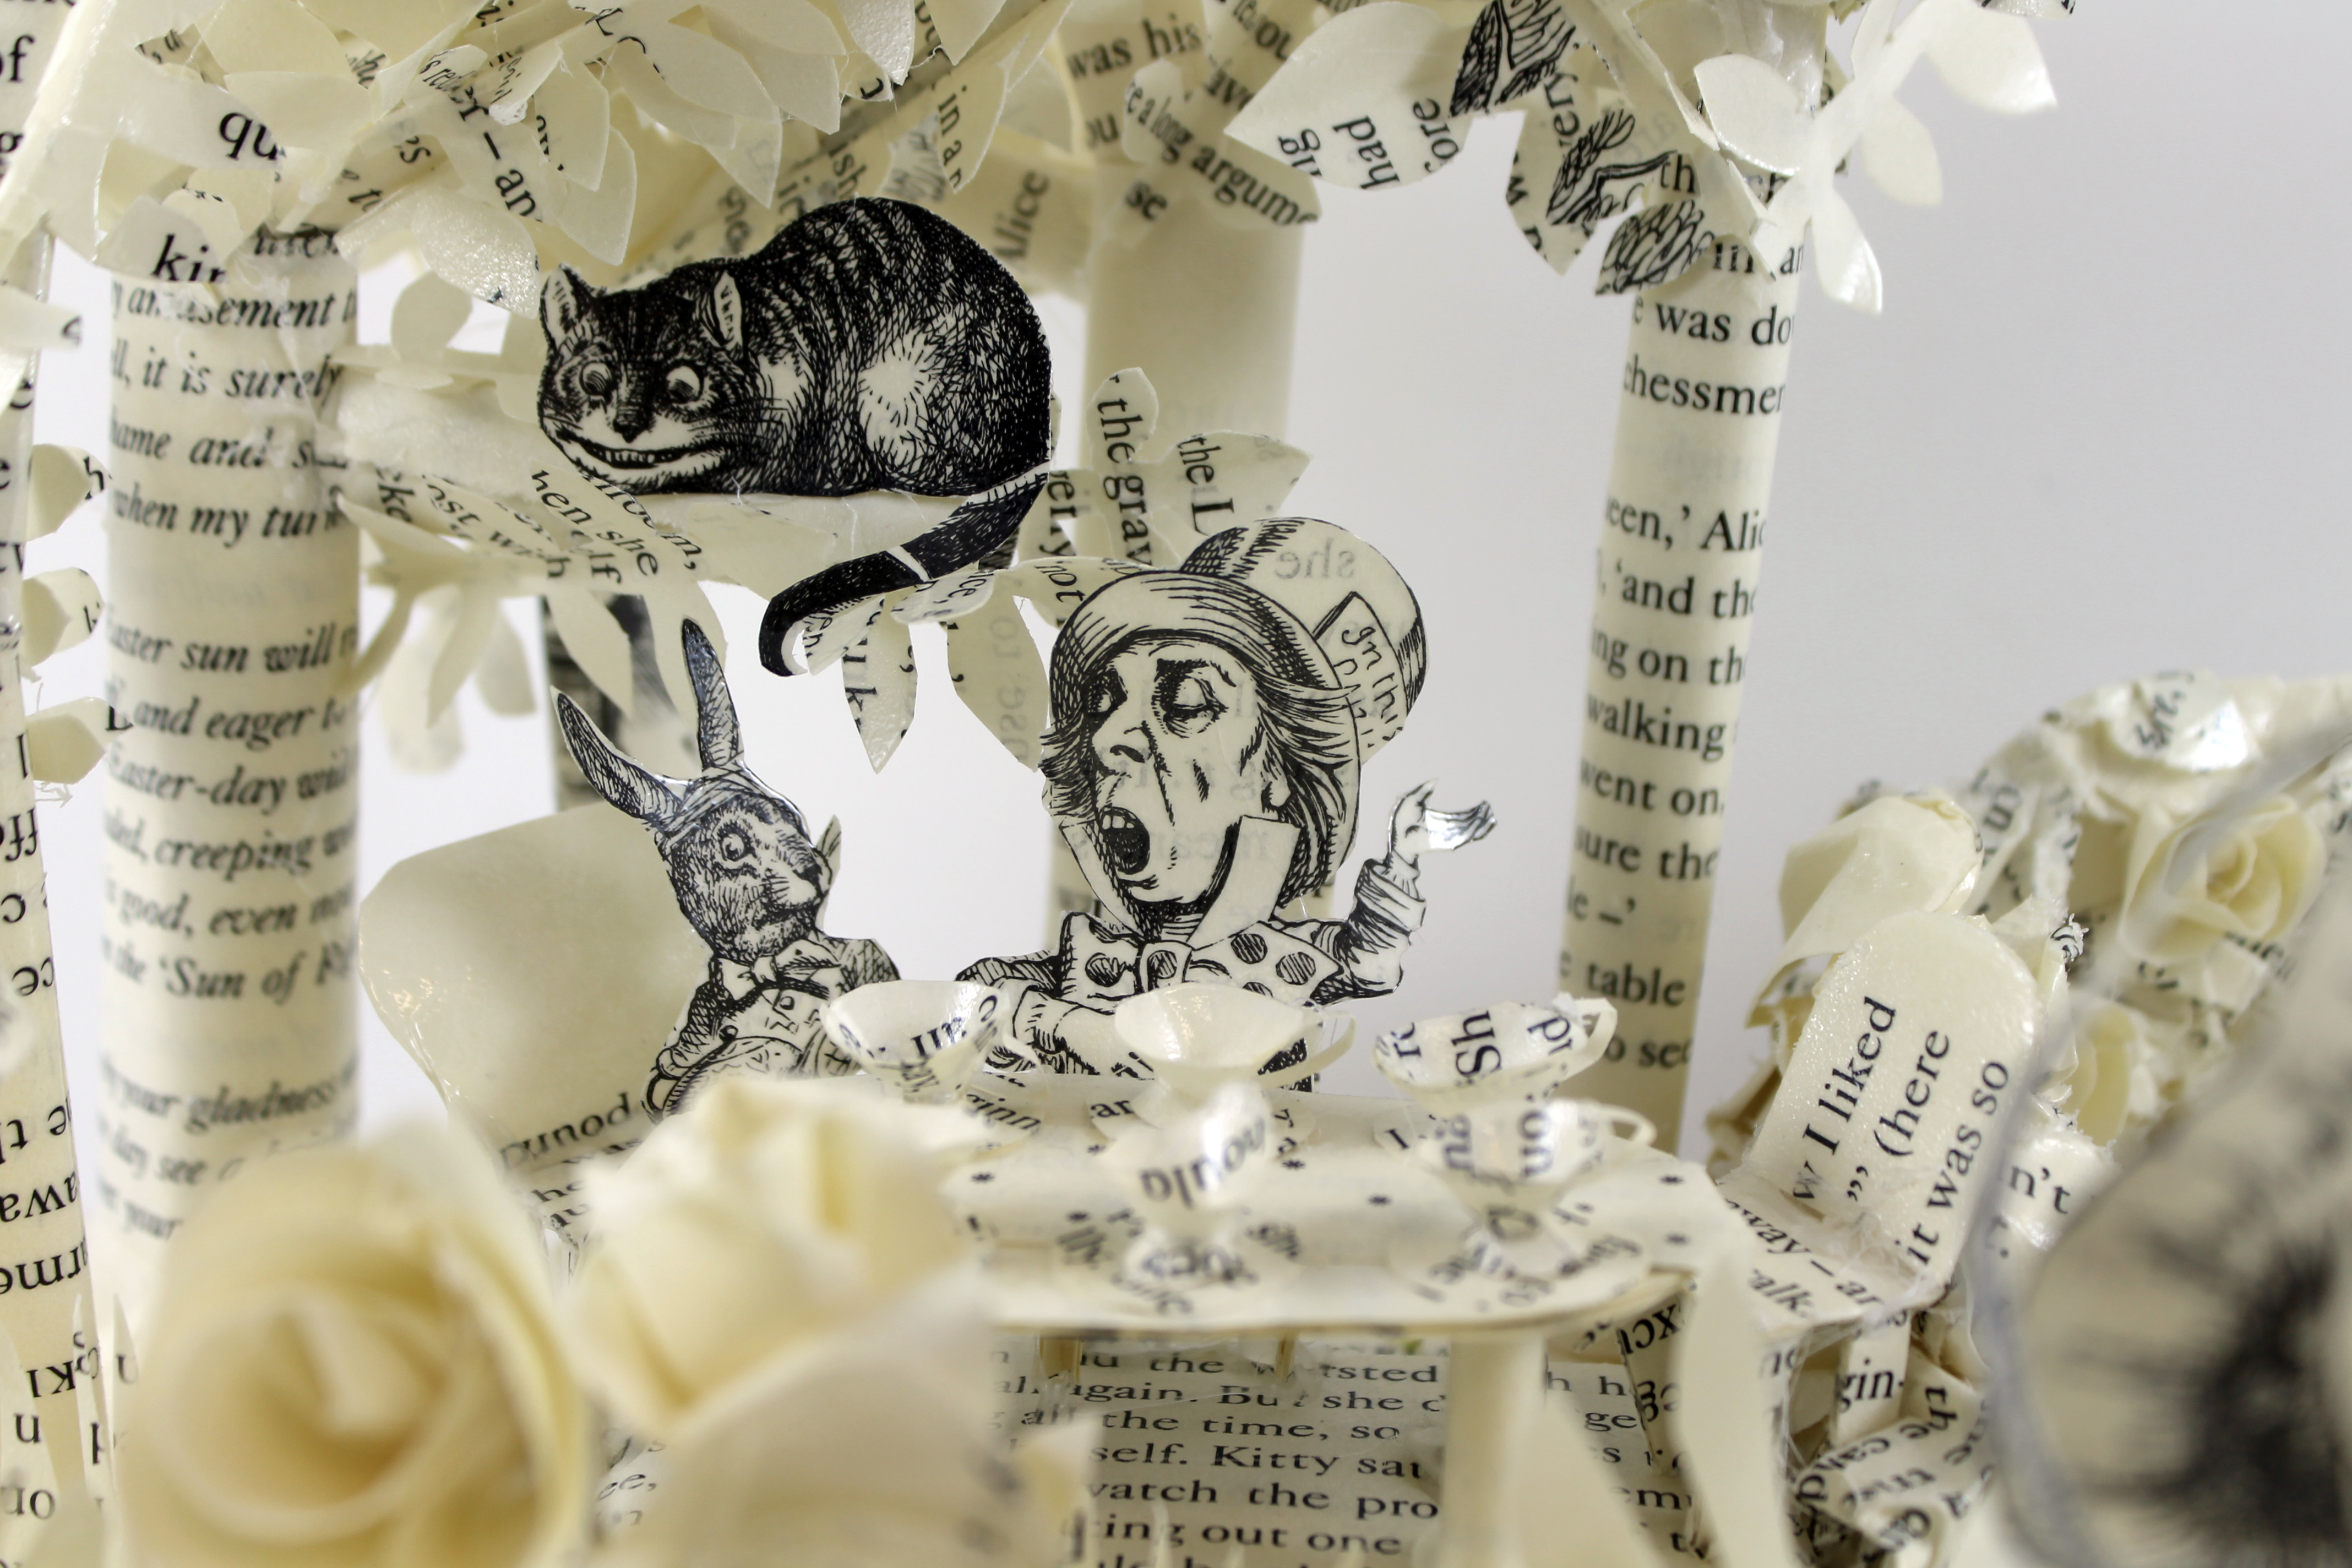 Mad Hatter Alice in Wonderland Book